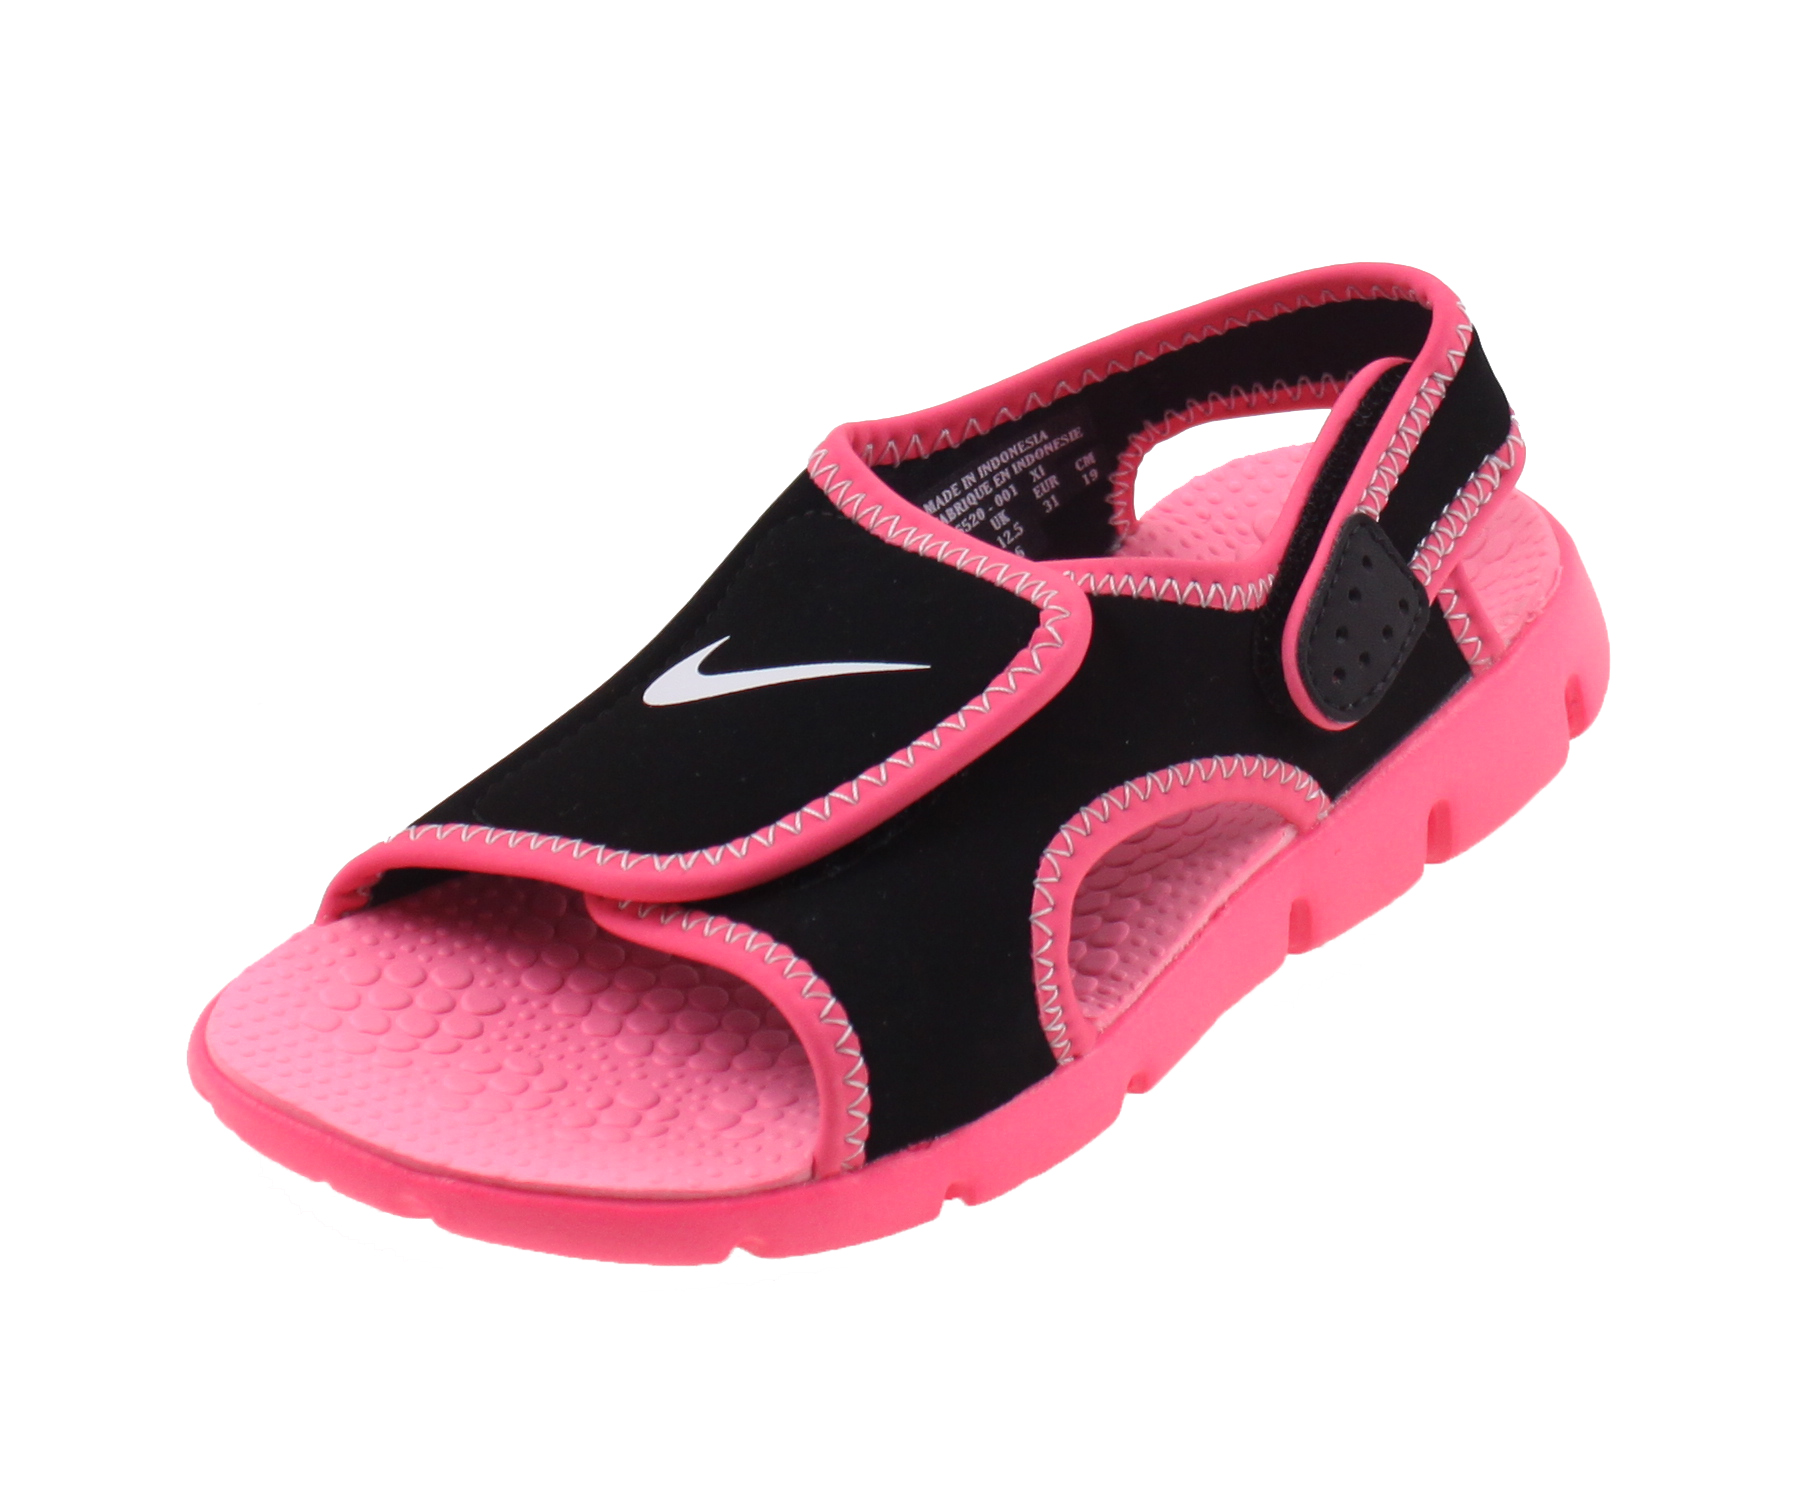 nike sunray adjust 4 sandalen zwart roze online kopen bij sportpaleis. Black Bedroom Furniture Sets. Home Design Ideas